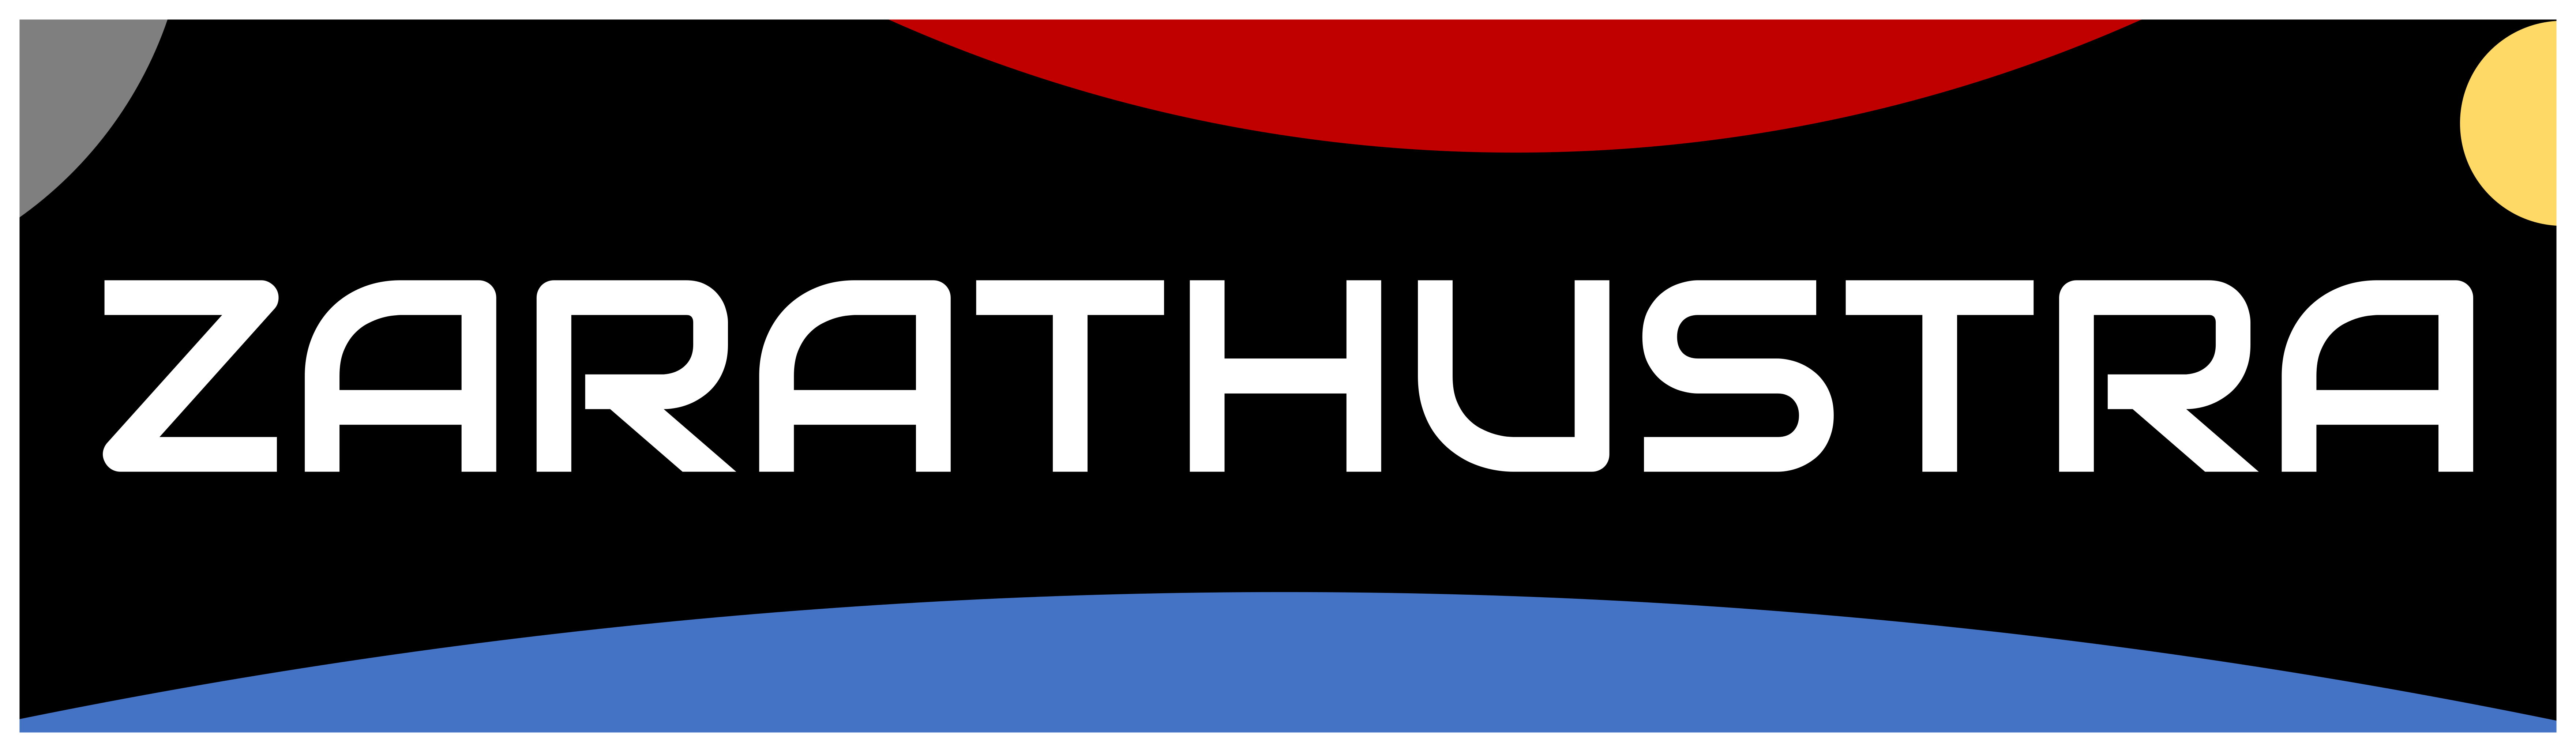 ERC-ZARATHUSTRA project